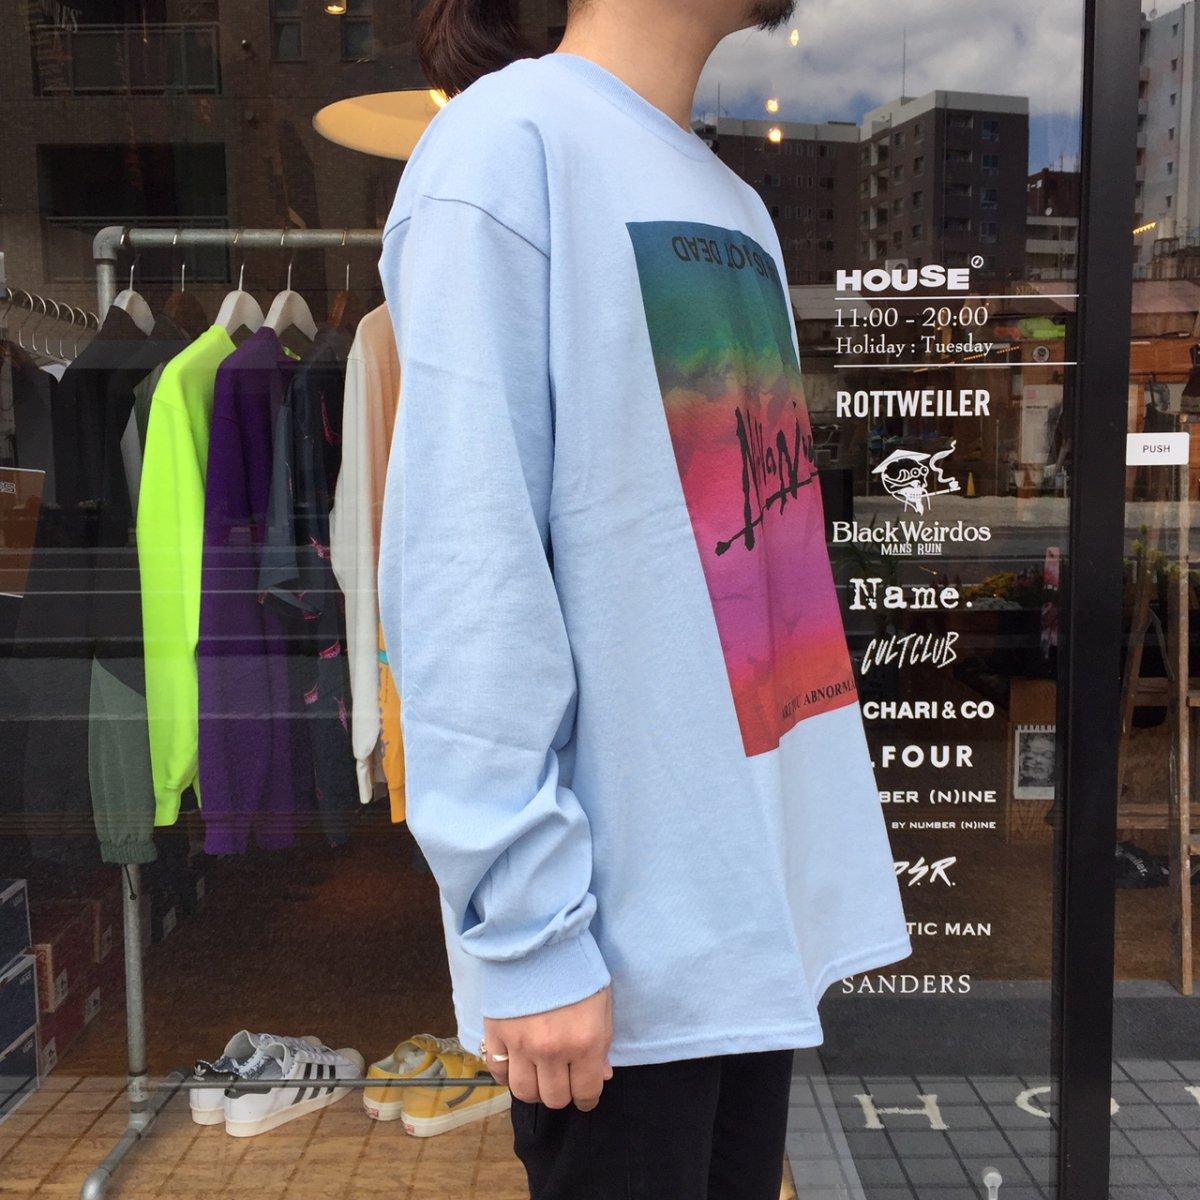 <img class='new_mark_img1' src='https://img.shop-pro.jp/img/new/icons3.gif' style='border:none;display:inline;margin:0px;padding:0px;width:auto;' />Black Weirdos  ブラック ウィドー / ロングTシャツ Nirvana ELVS L/S Tee 【SKY】